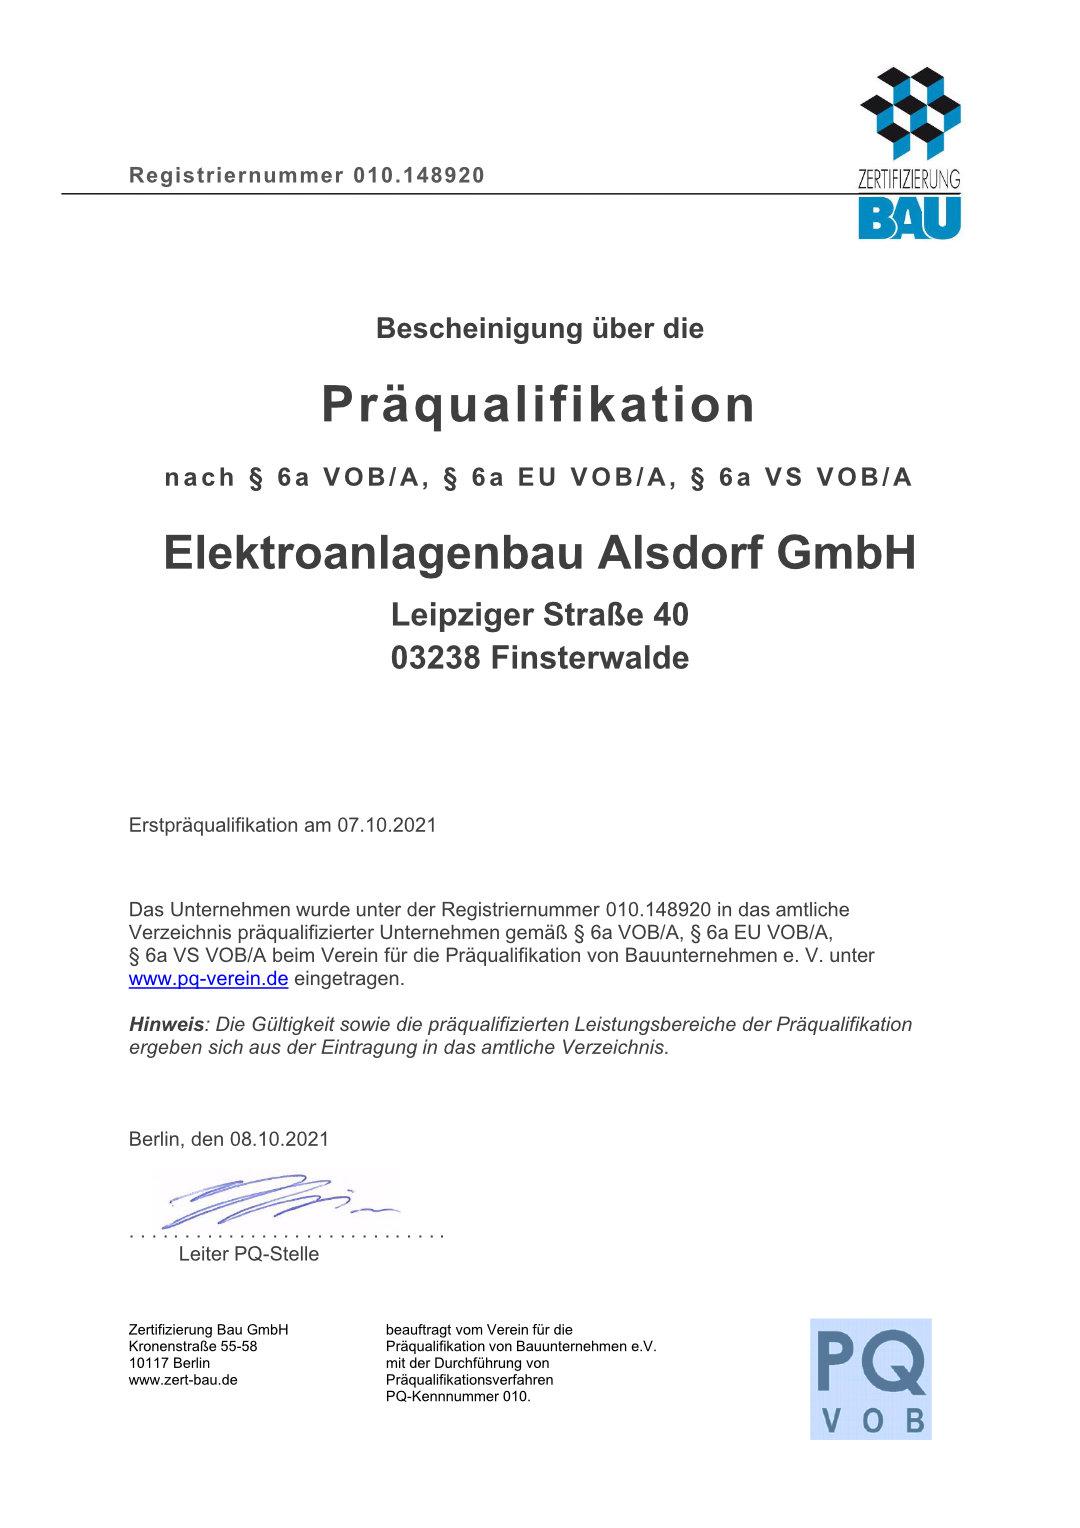 PQ-VOB Zertifikat